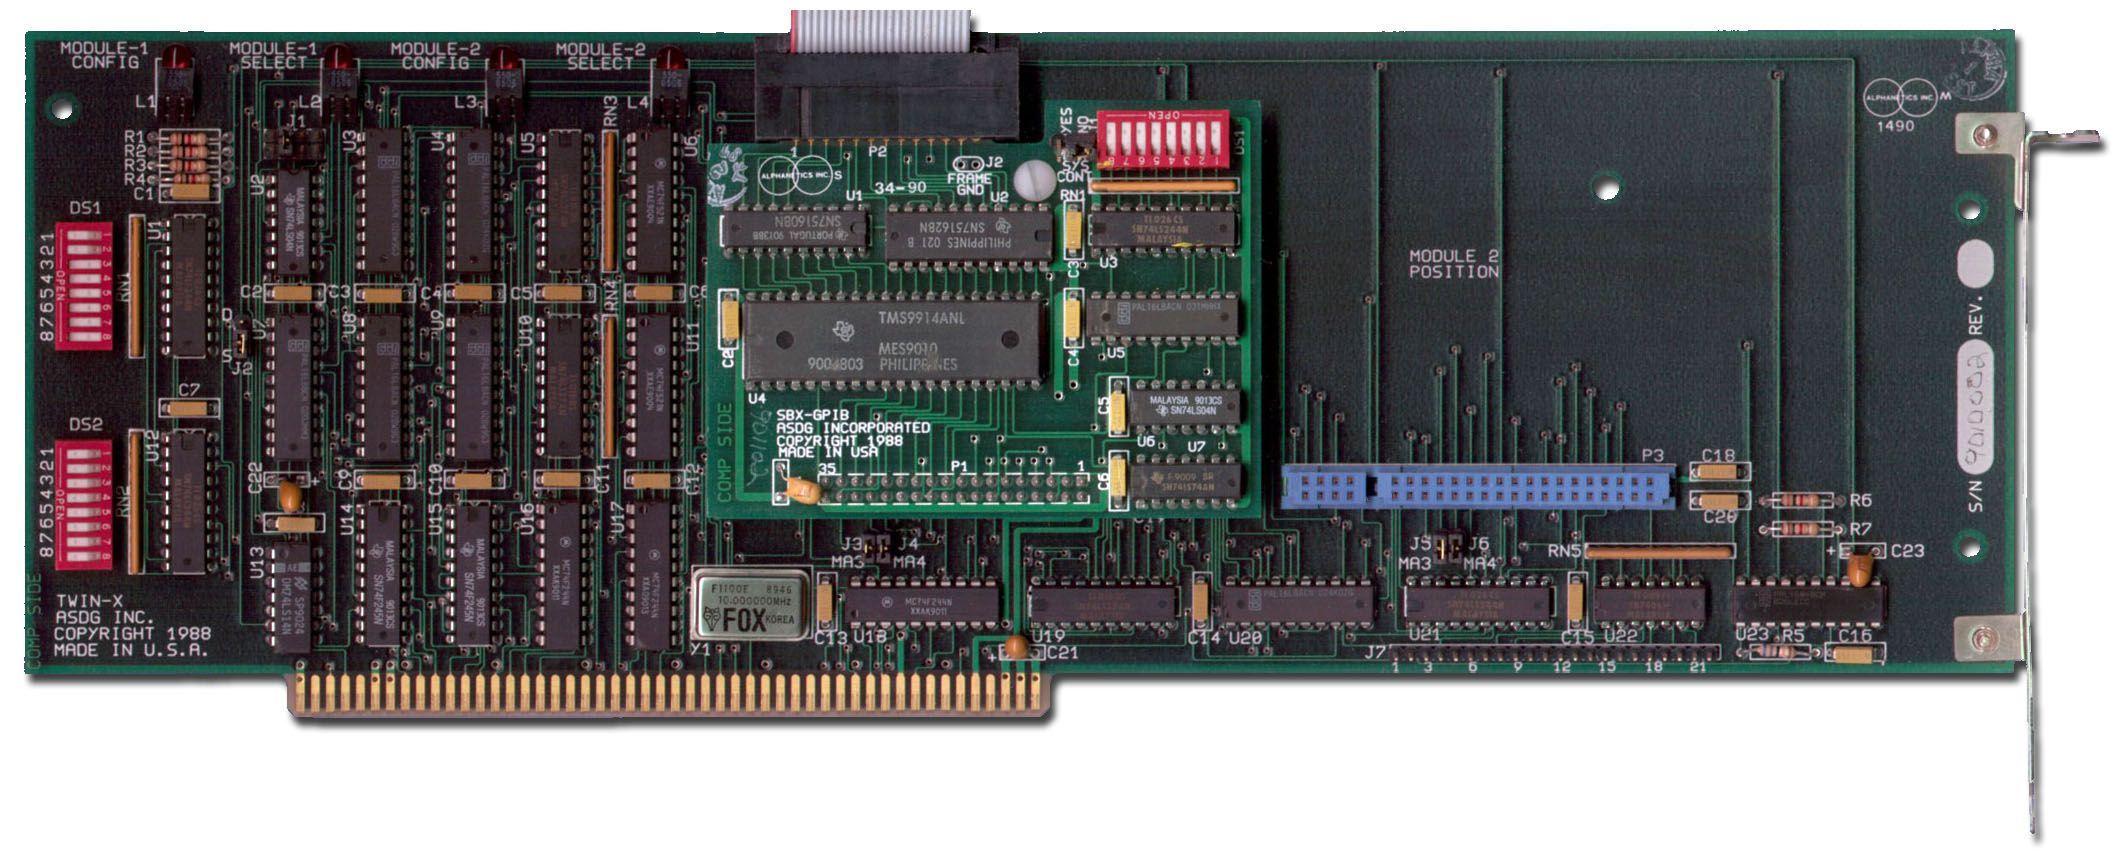 PILOTE CONTROLEUR HOTE SCSI/RAID GRATUITEMENT